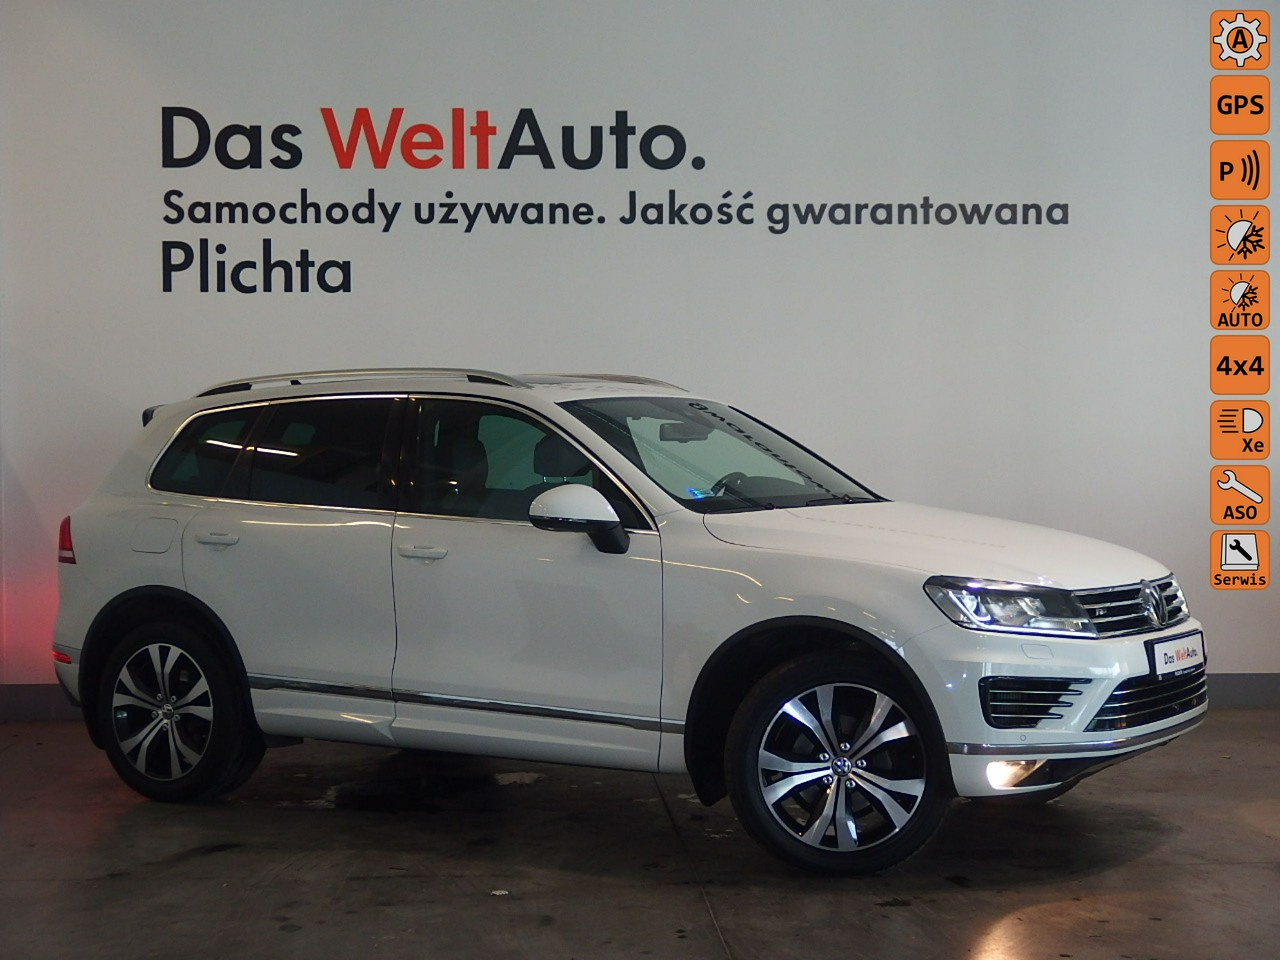 3.0 TDI Perfectline R-style Gwarancja 12 miesięcy Dealer Plichta VW FV